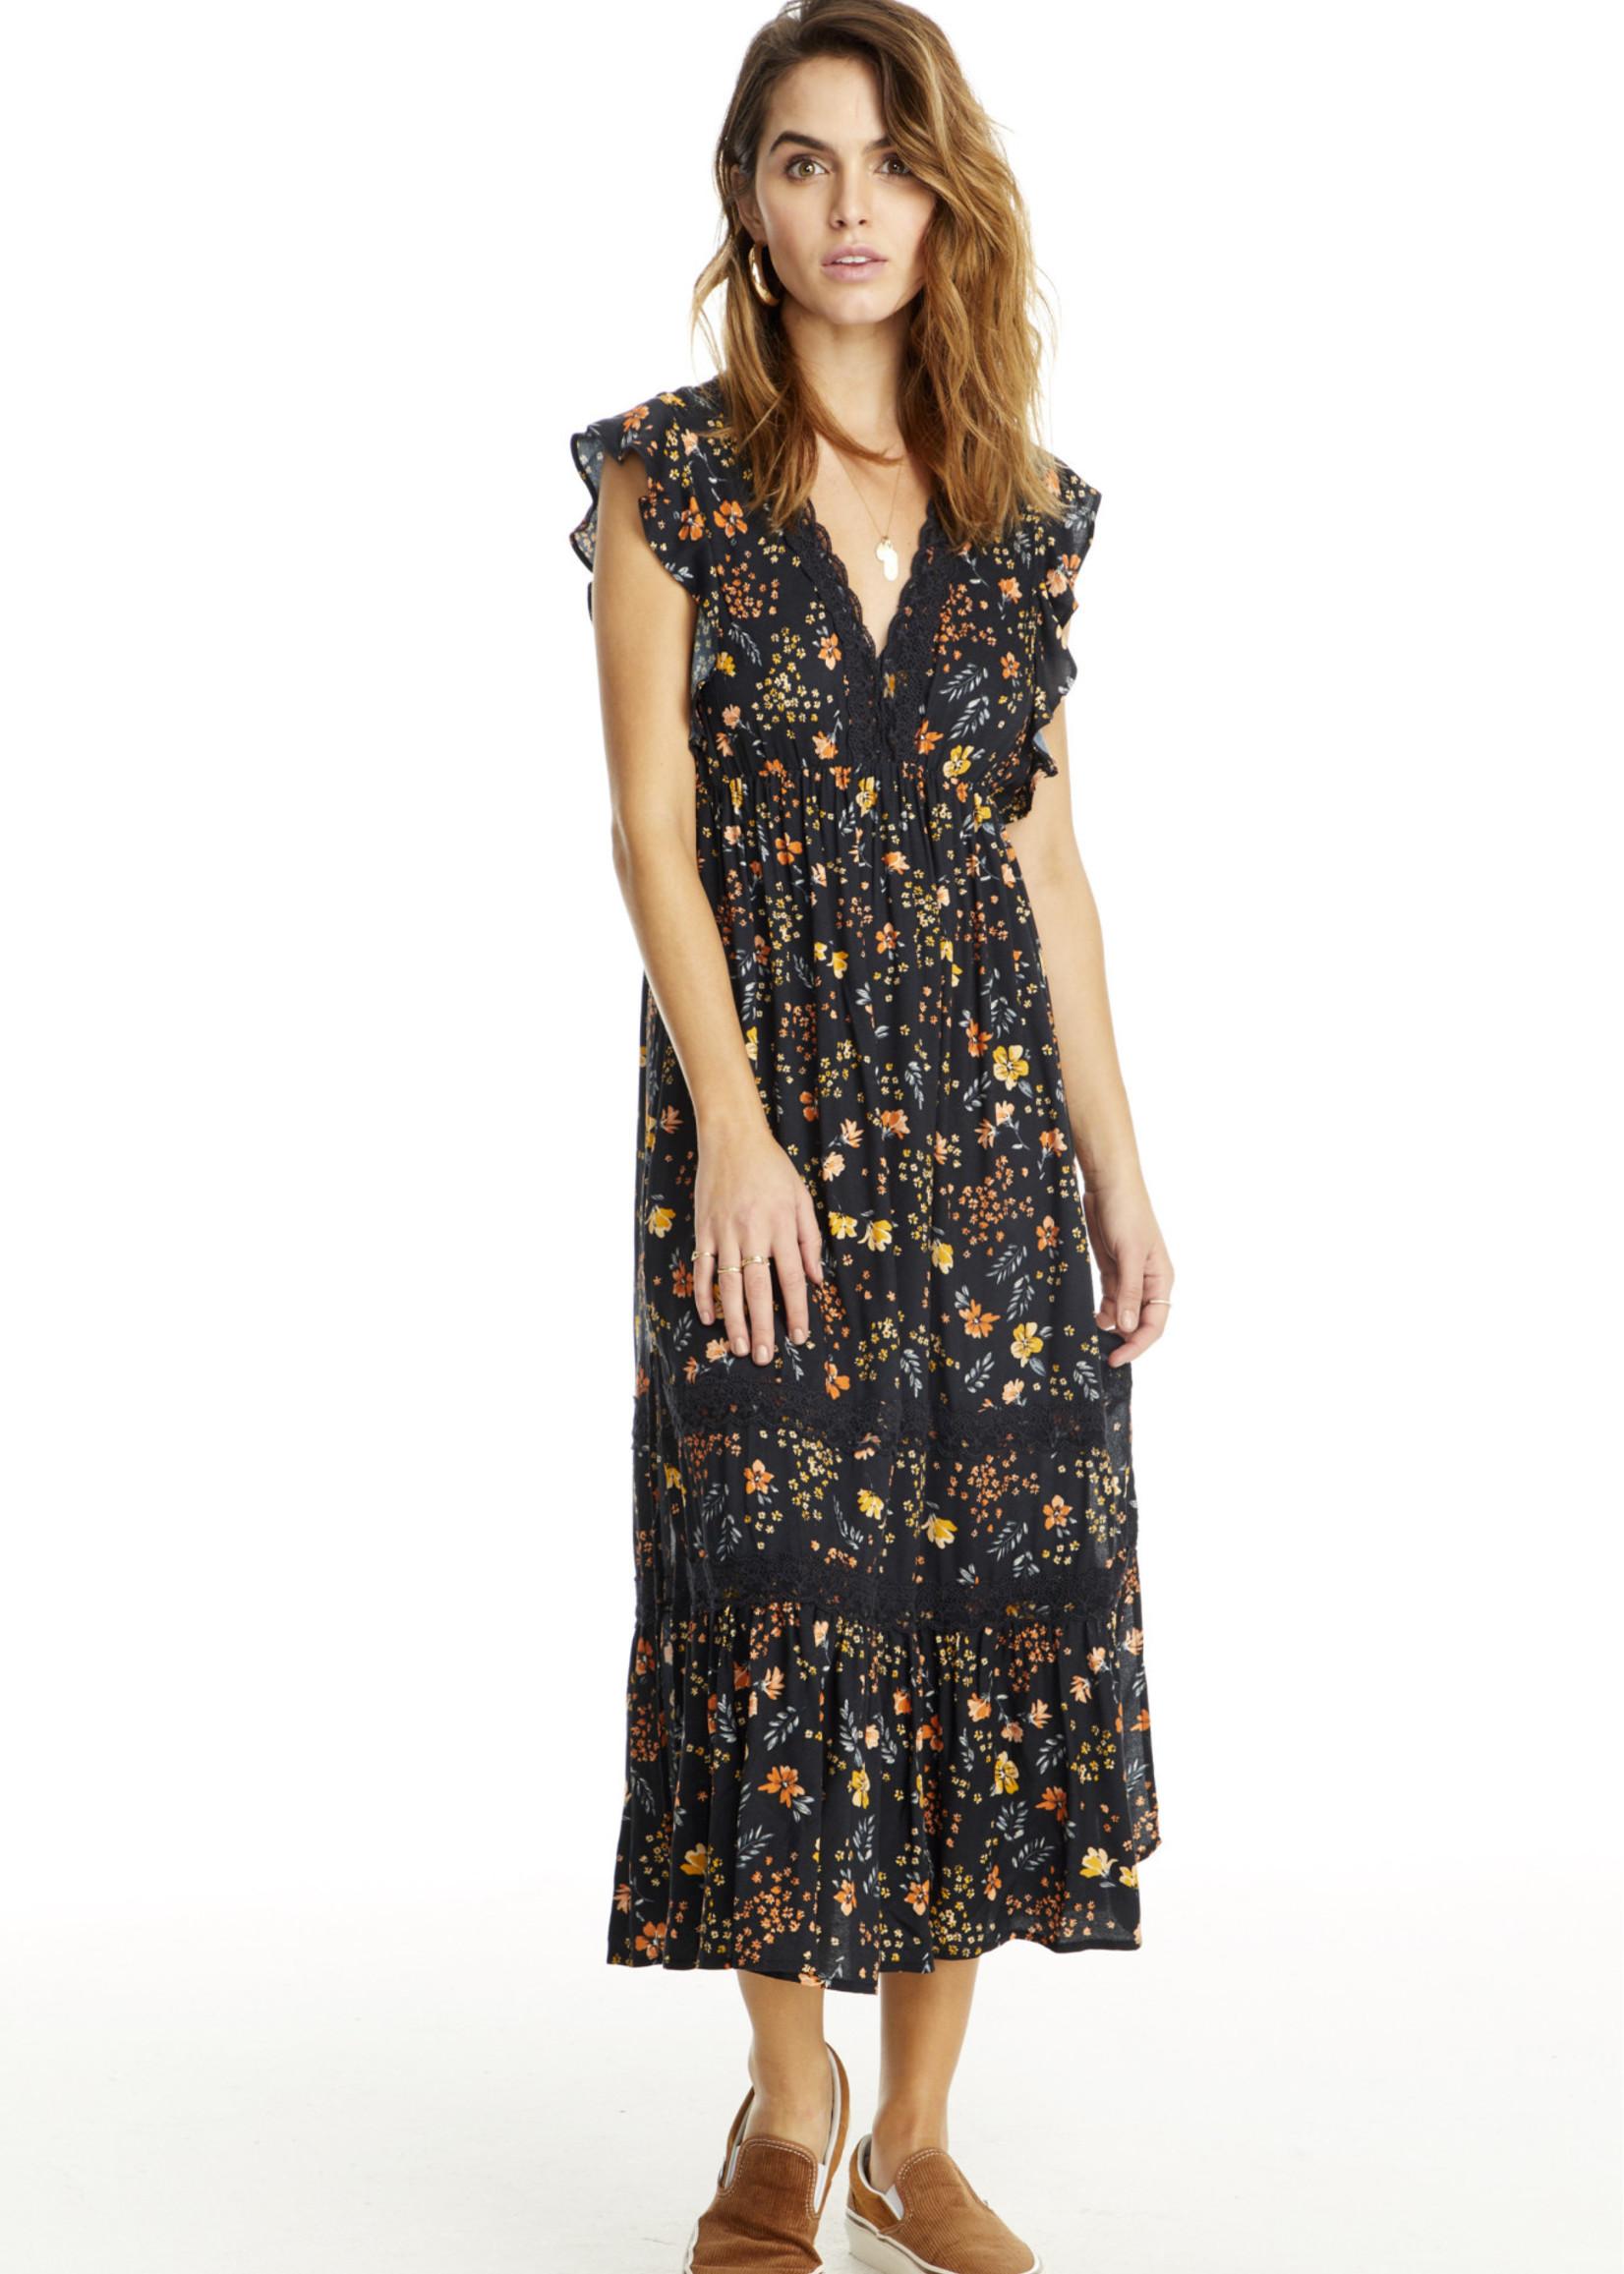 SALTWATER LUXE BoHo Midi Dress